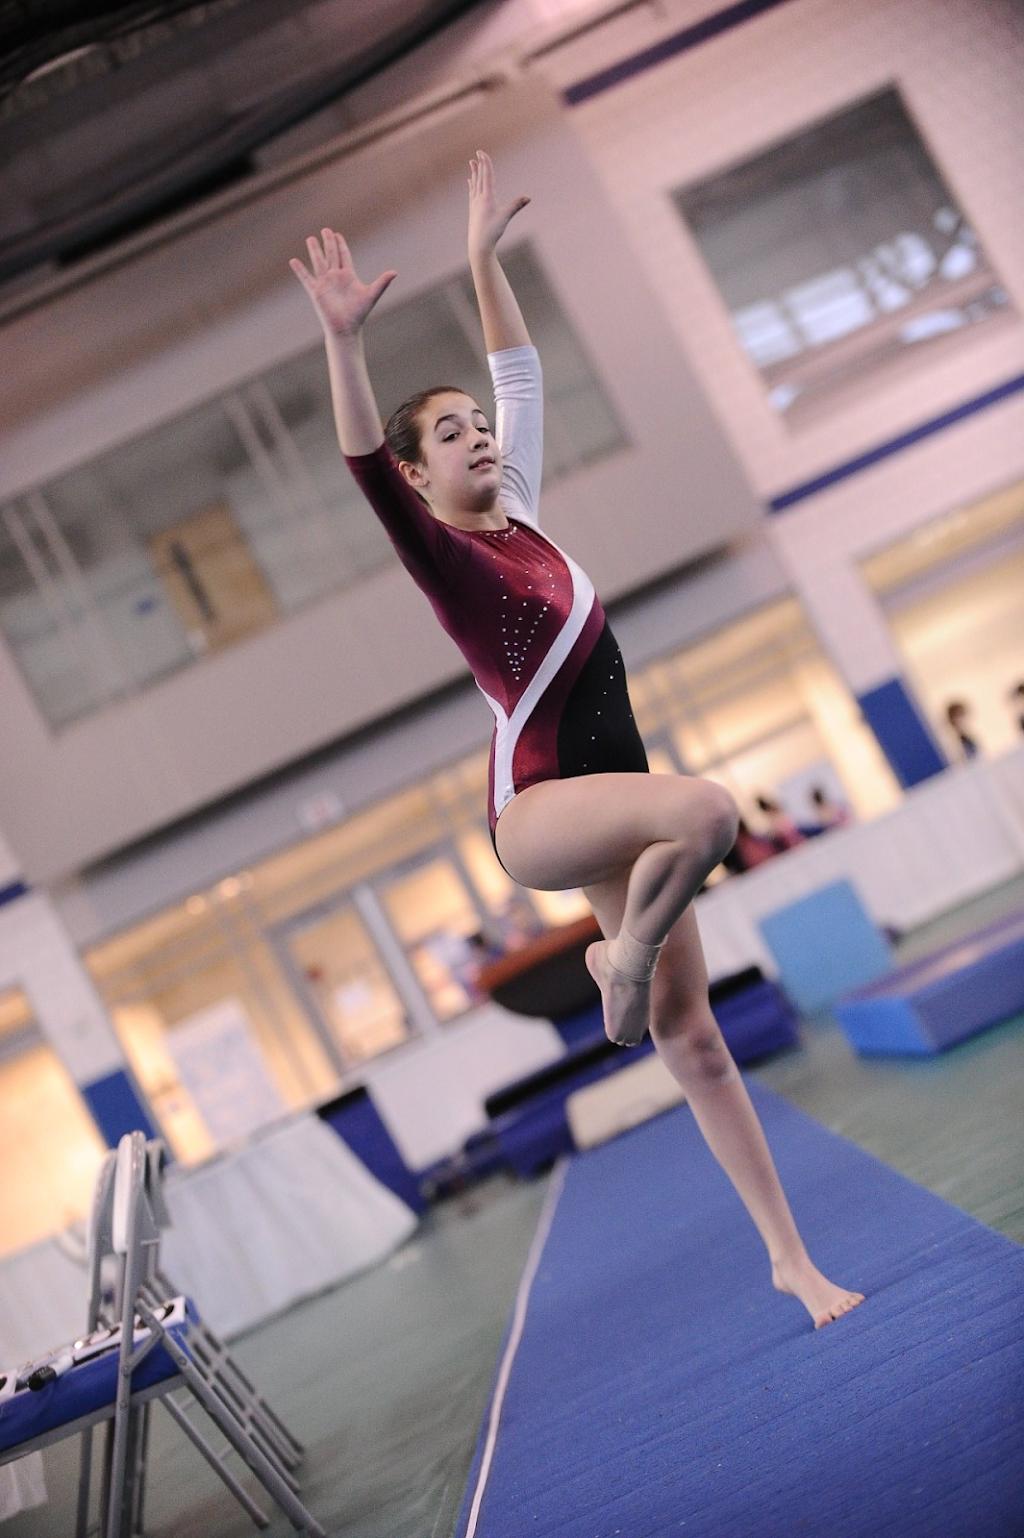 Suffield Gymnastics Academy - gym  | Photo 7 of 10 | Address: 110A Ffyler Pl, Suffield, CT 06078, USA | Phone: (860) 936-1833